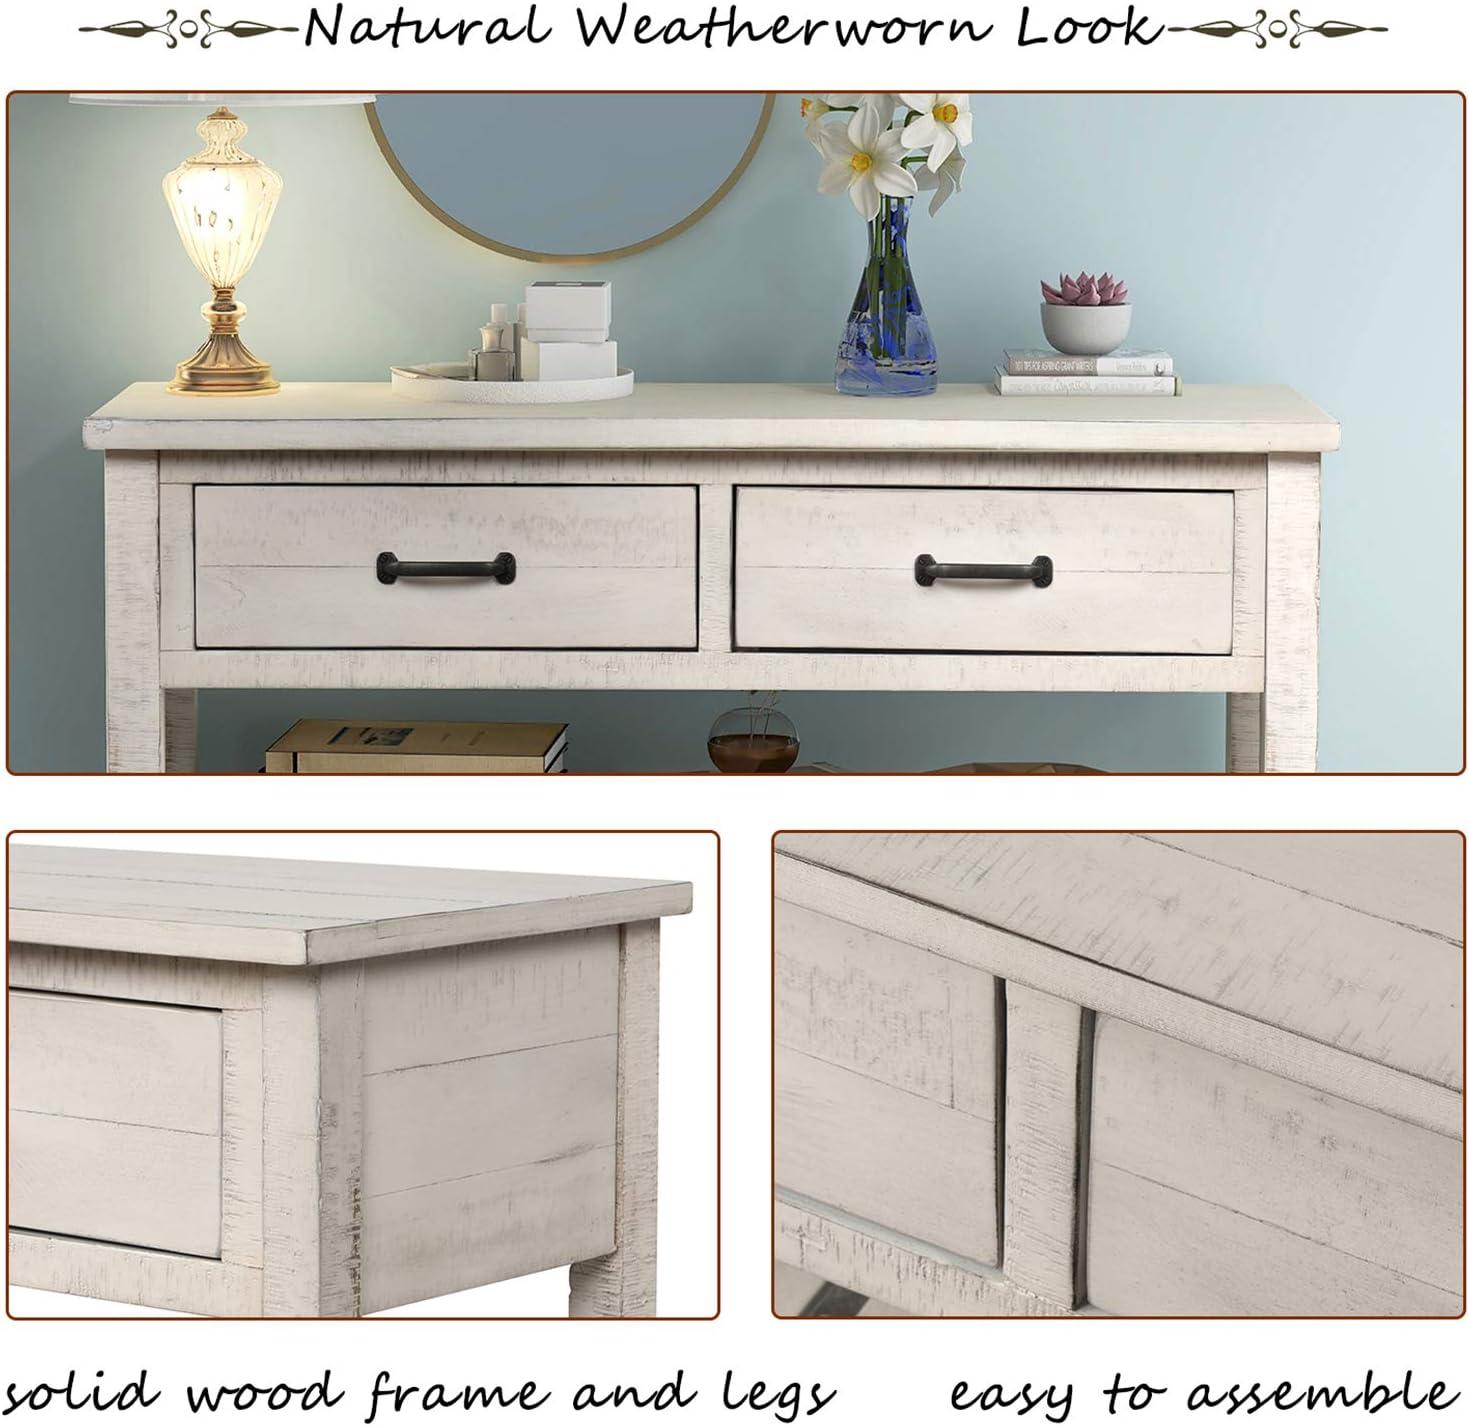 P PURLOVE Console Table Sofa Table with Drawers Console Table for Entryway with Drawers and 2 Tiers Wood Shelf (Retro White)